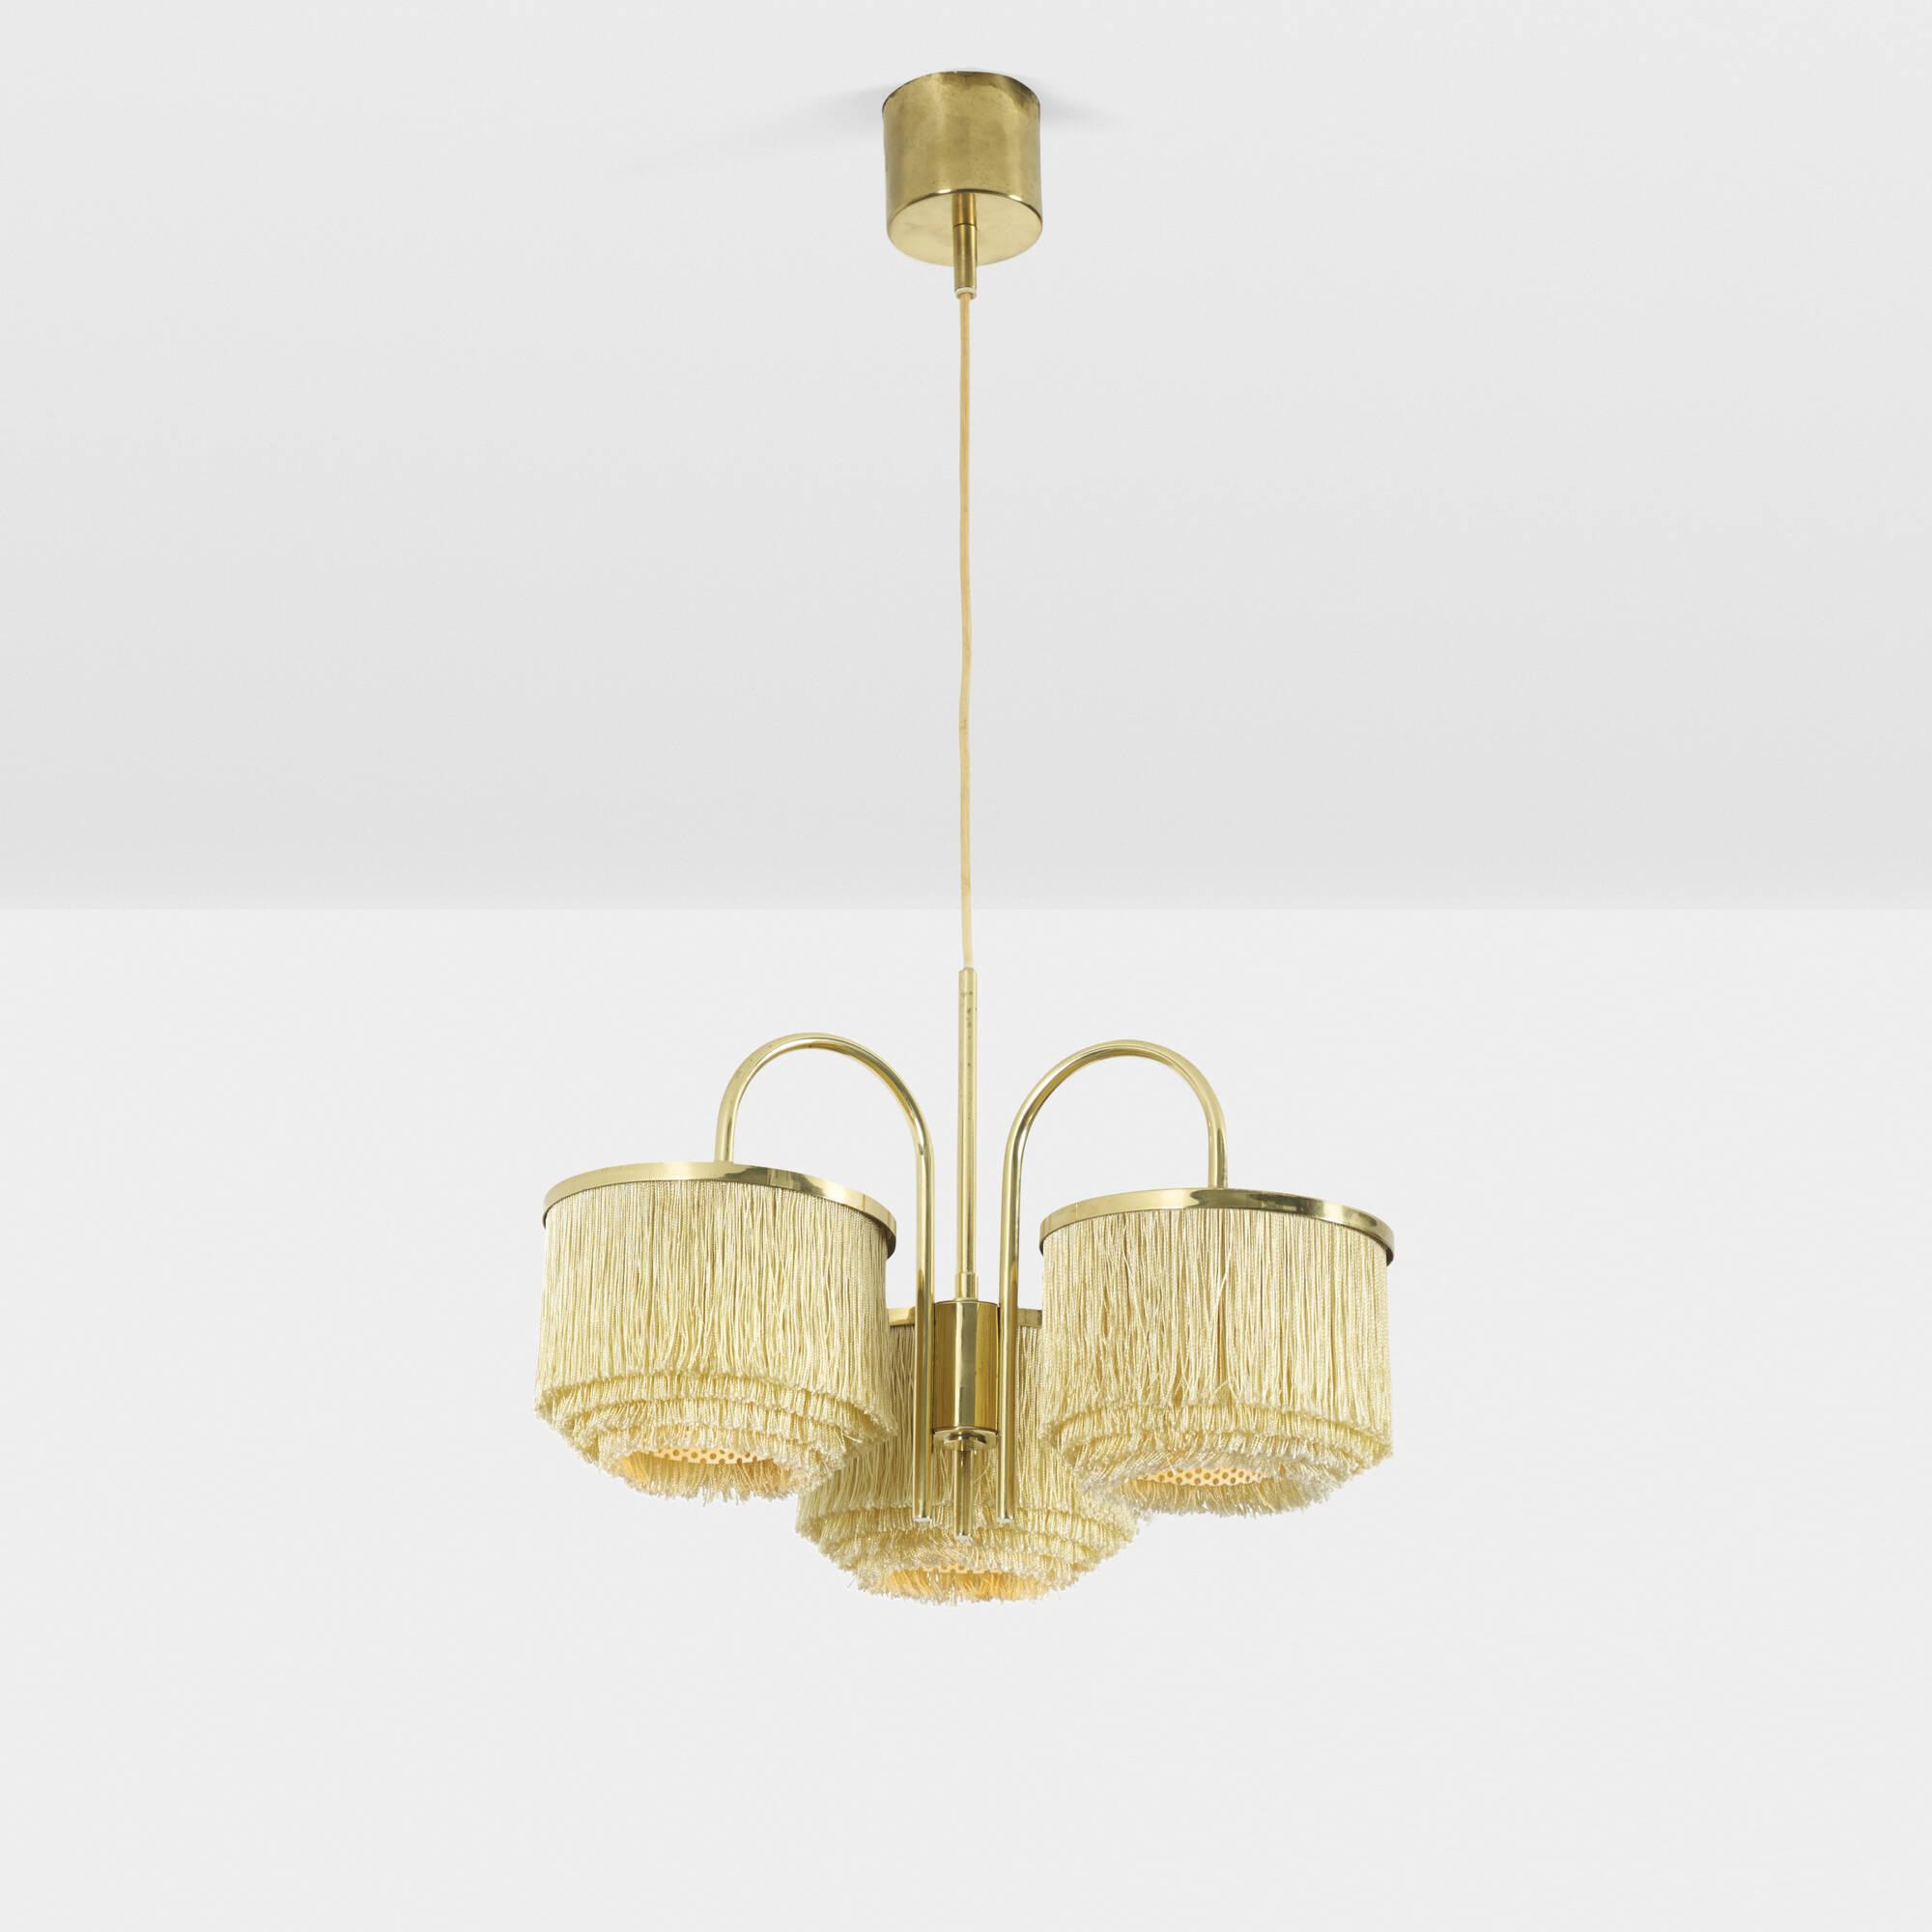 313: Hans-Agne Jakobsson / chandelier (1 of 1)